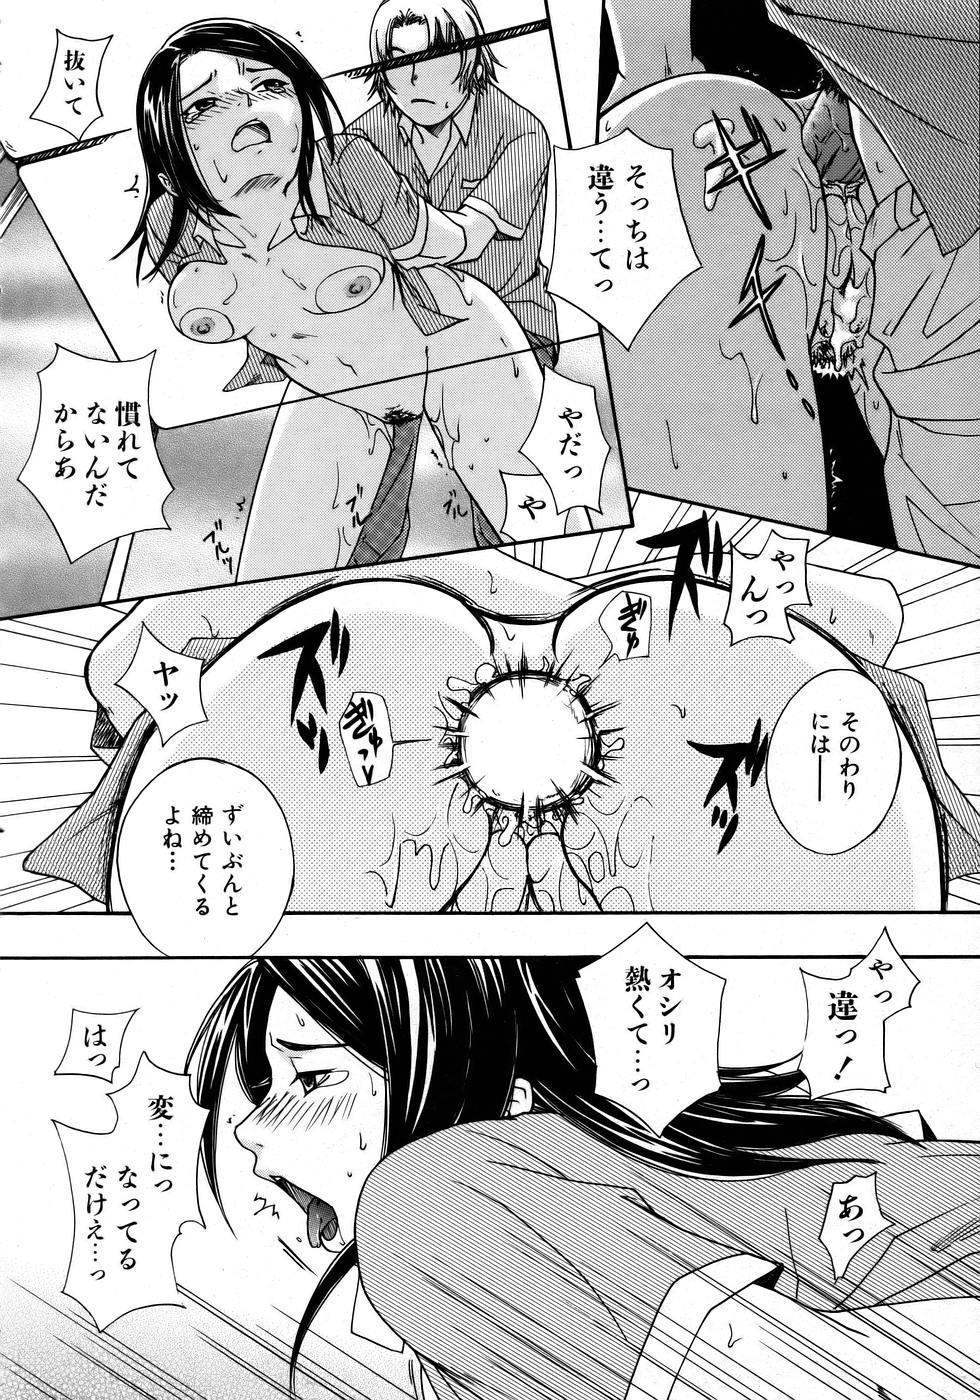 COMIC AUN 2005-12 Vol. 115 241